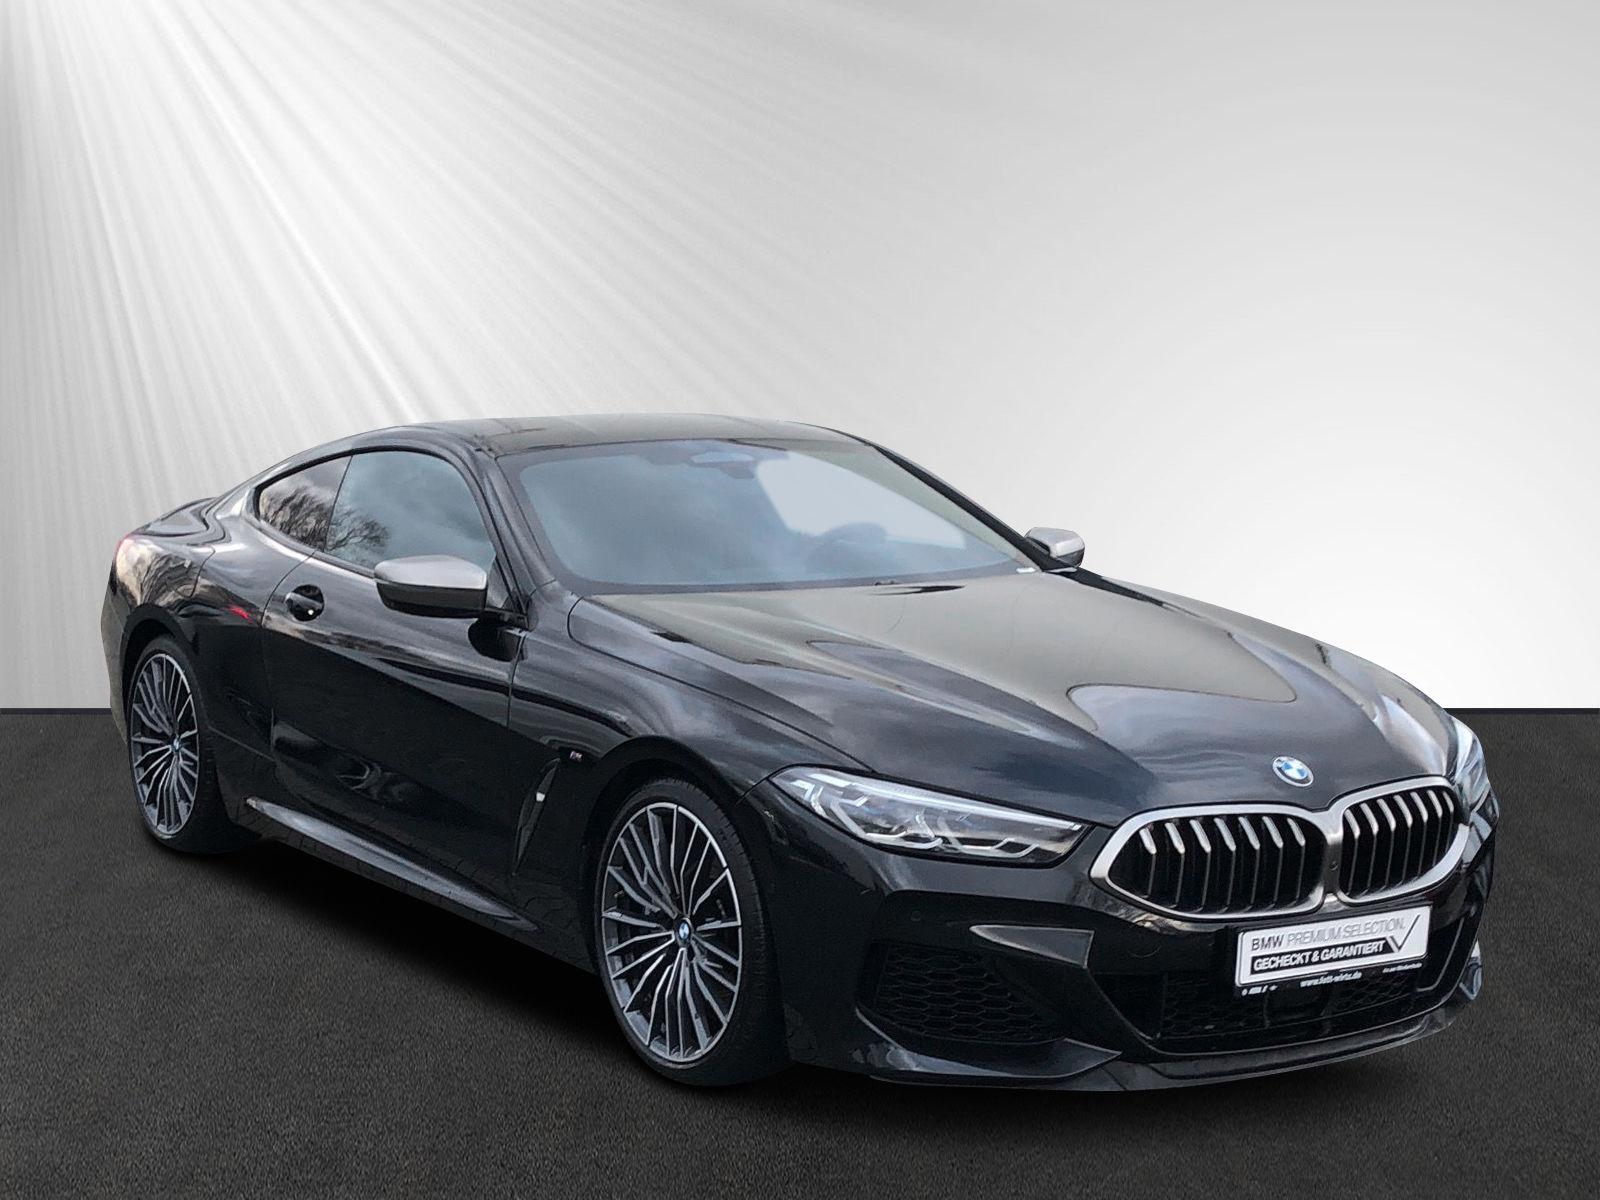 BMW M850i xDrive Coupe 20'' M LMR Laser DA+ PA+, Jahr 2019, petrol